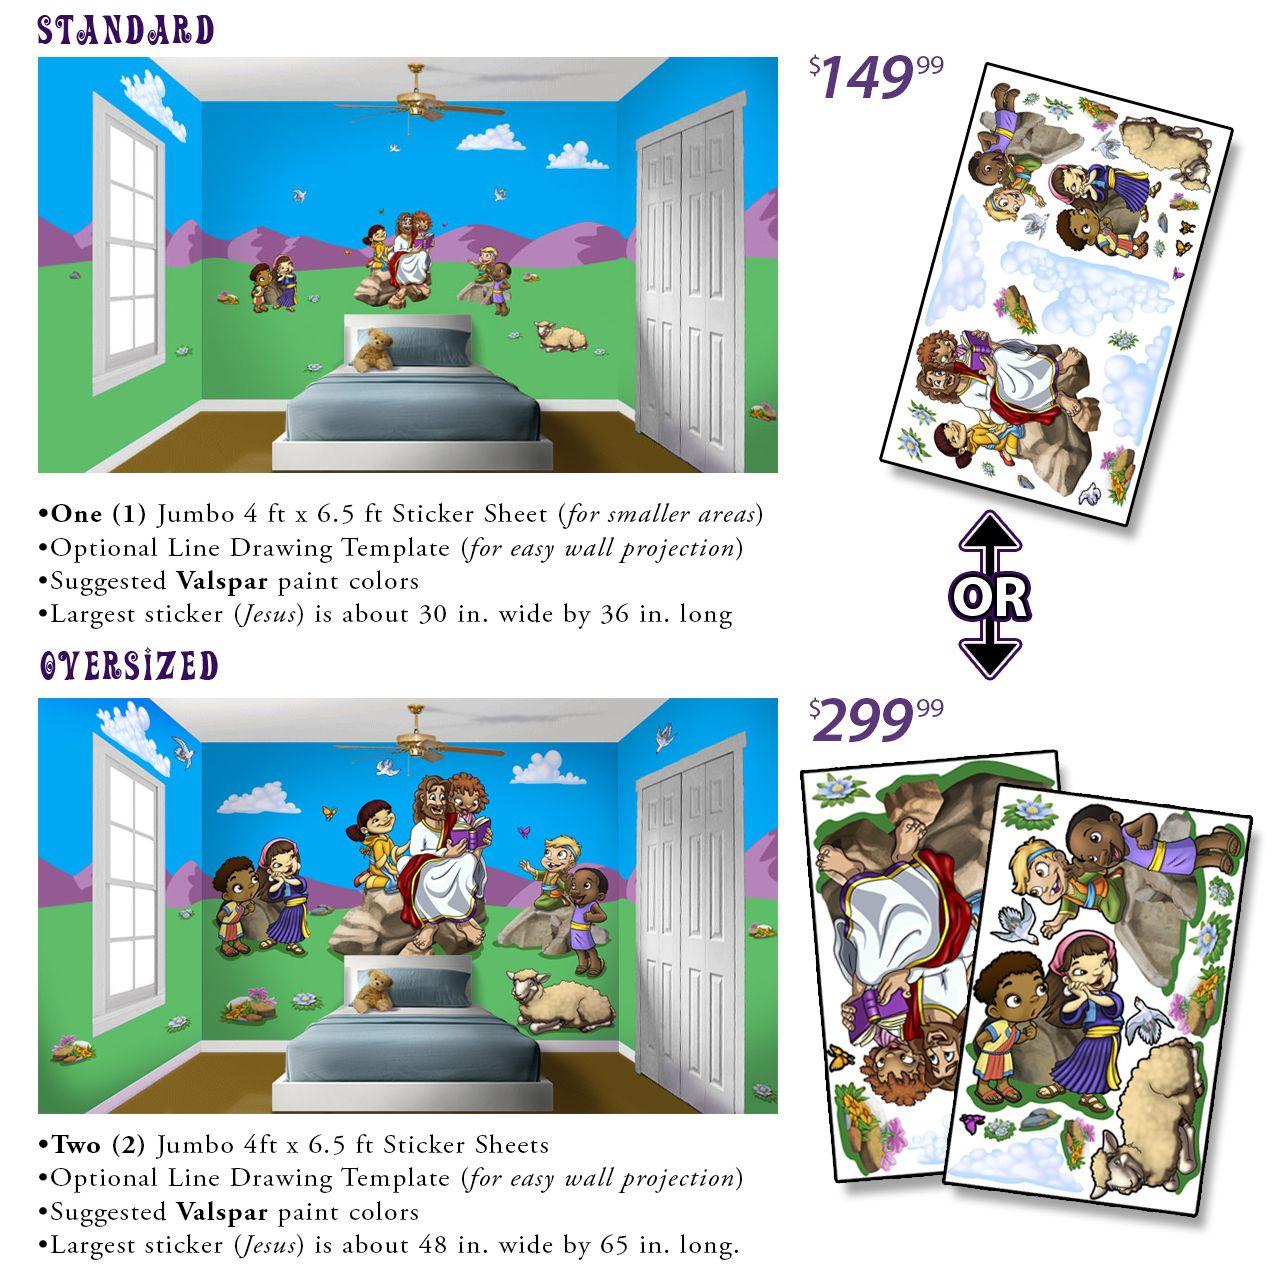 Wacky World Studios - Jesus Stories Peel'N'Stick - Room In A Tube, $149.99 (http://themes-to-go.com/jesus-stories-peelnstick-room-in-a-tube/)